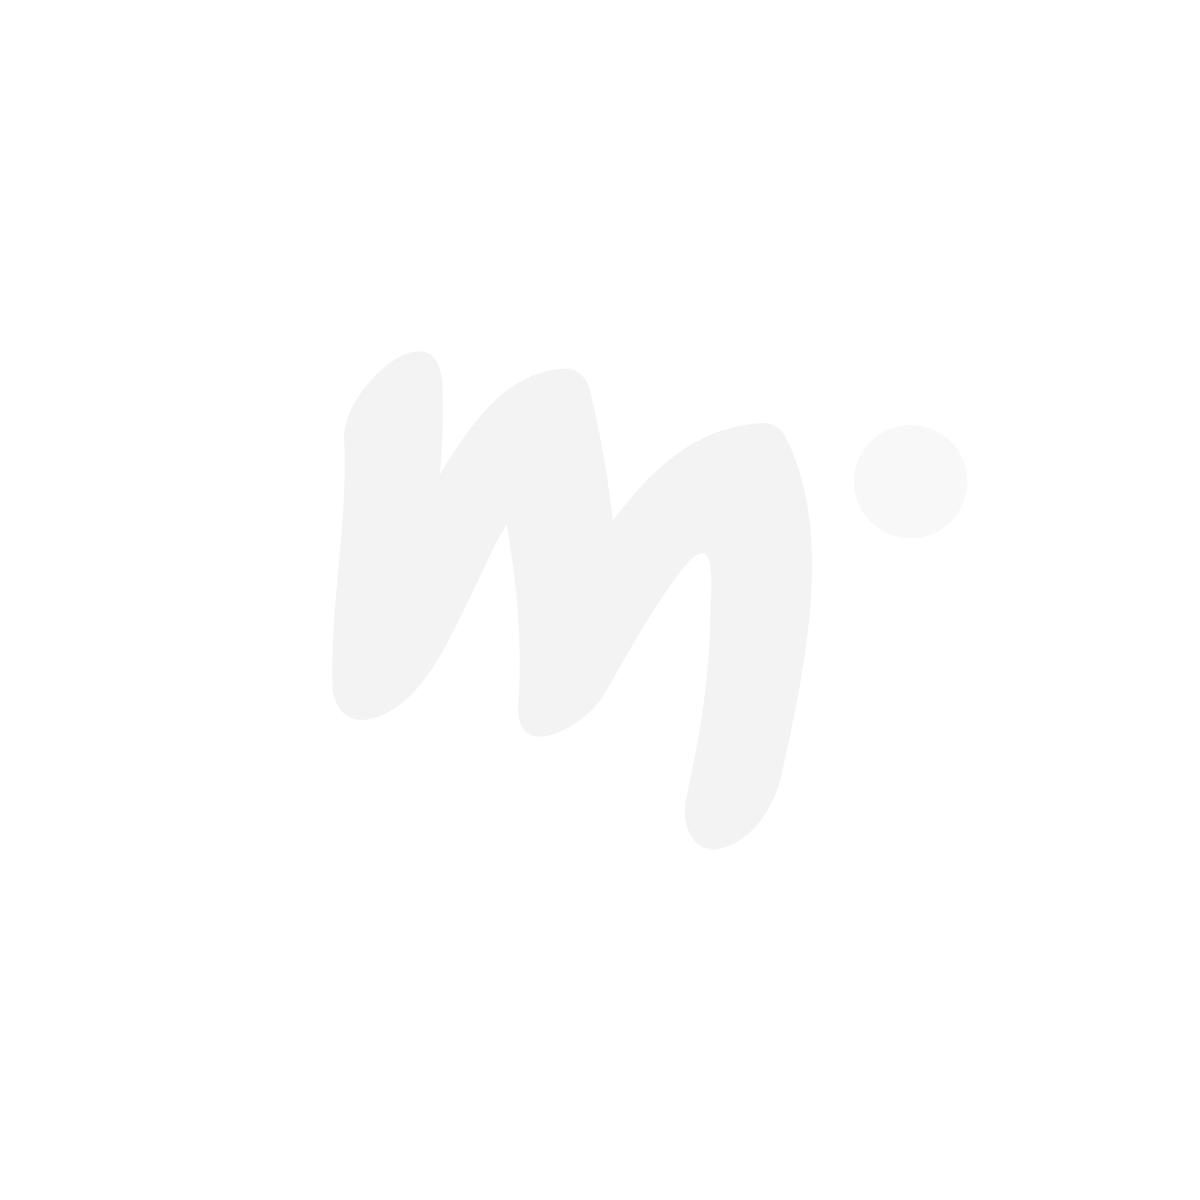 Peppi Pitkätossu Peppi-alushousut 2 kpl